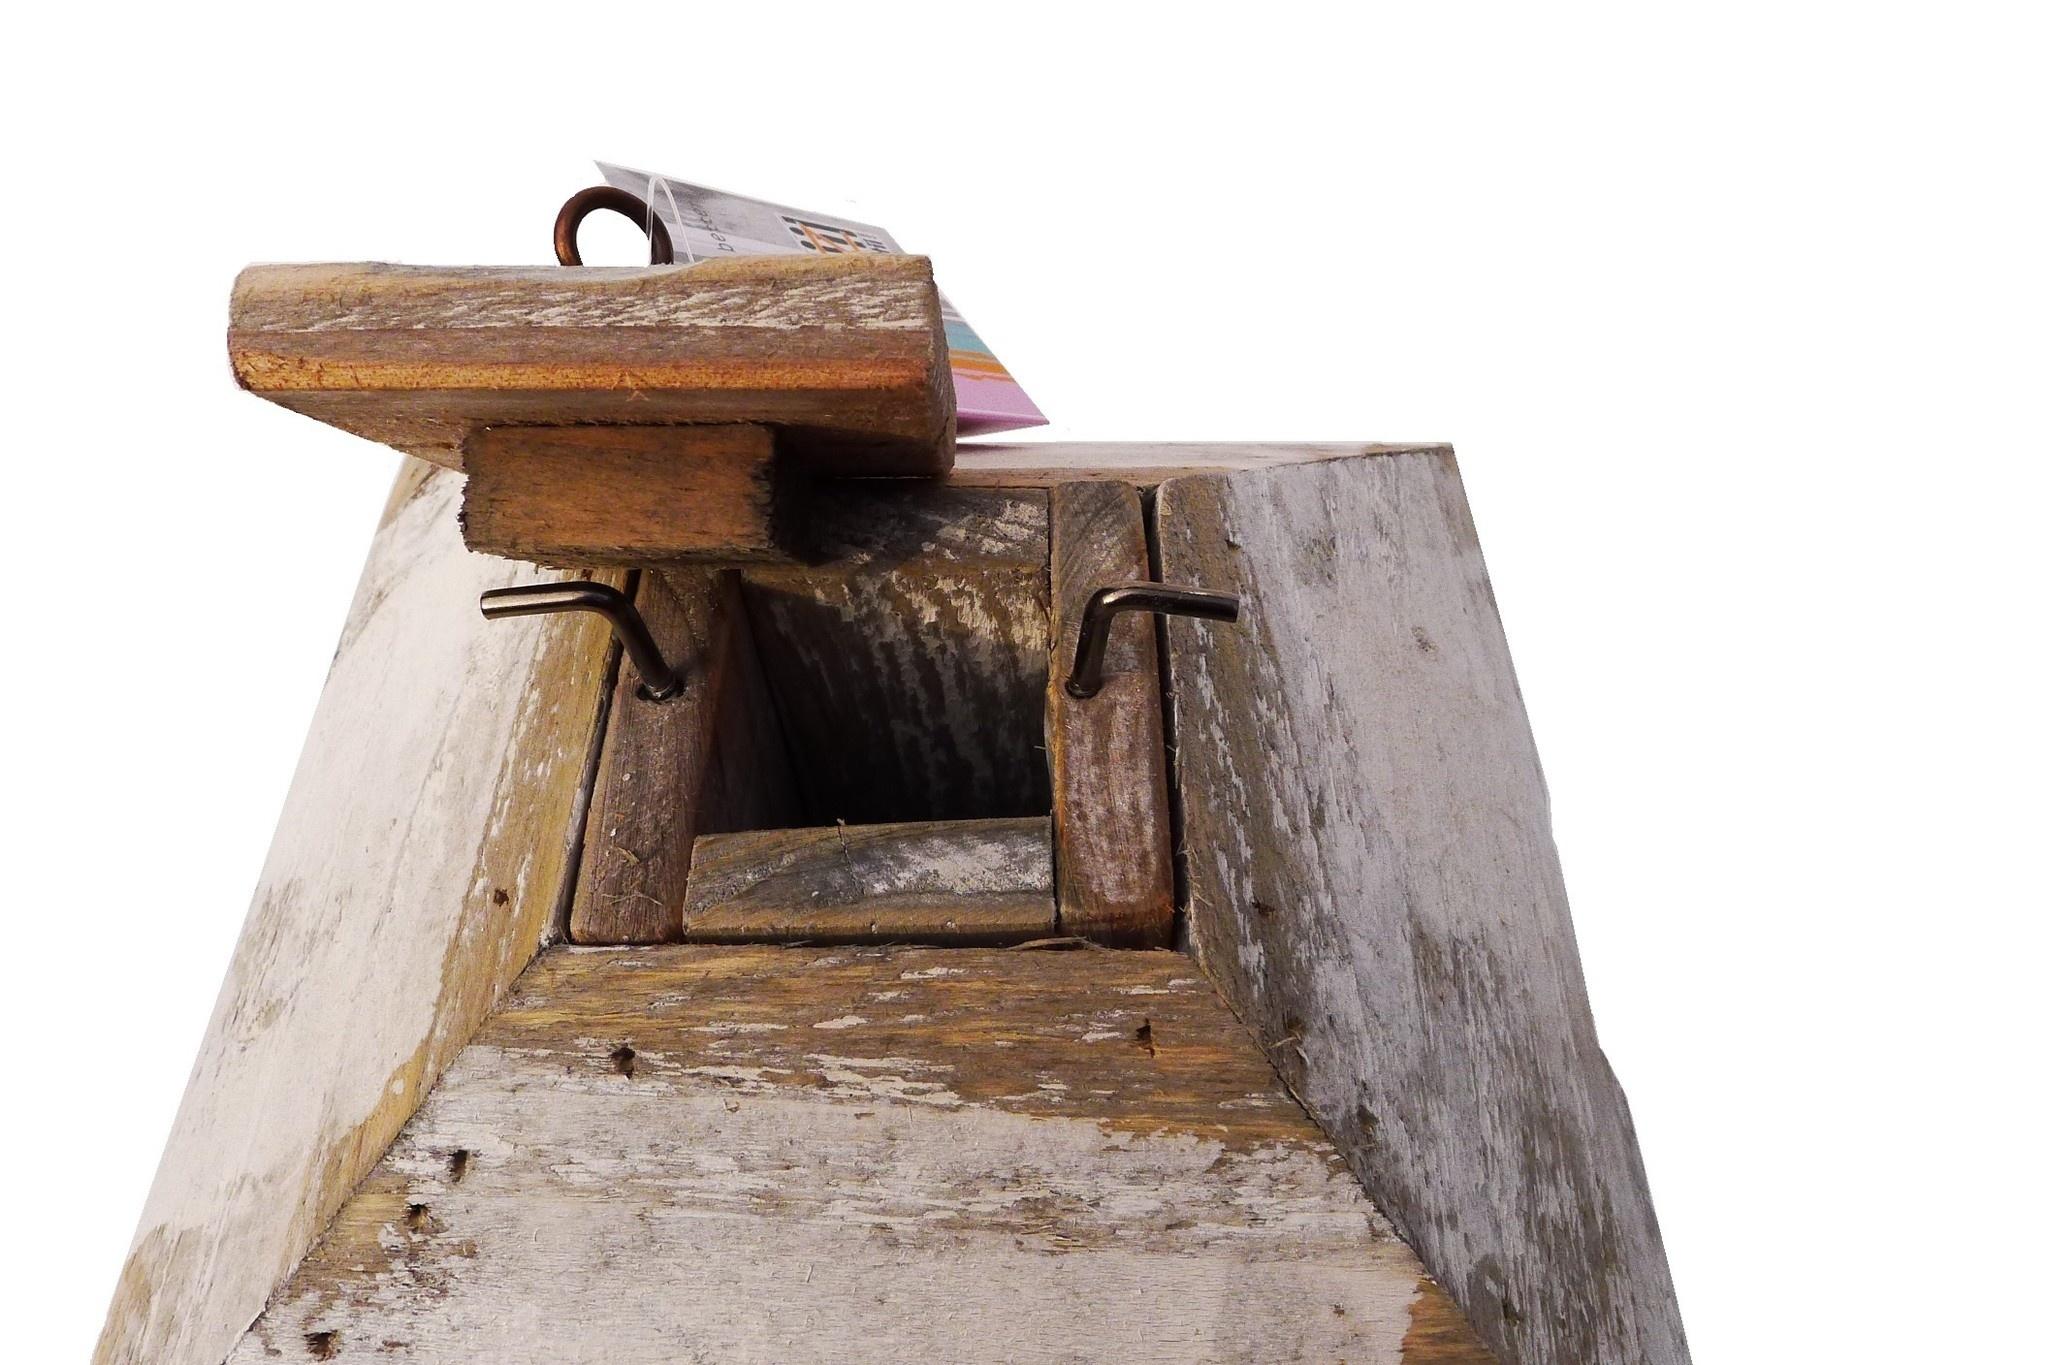 birdhouse old dutch StB mushroom tall-8